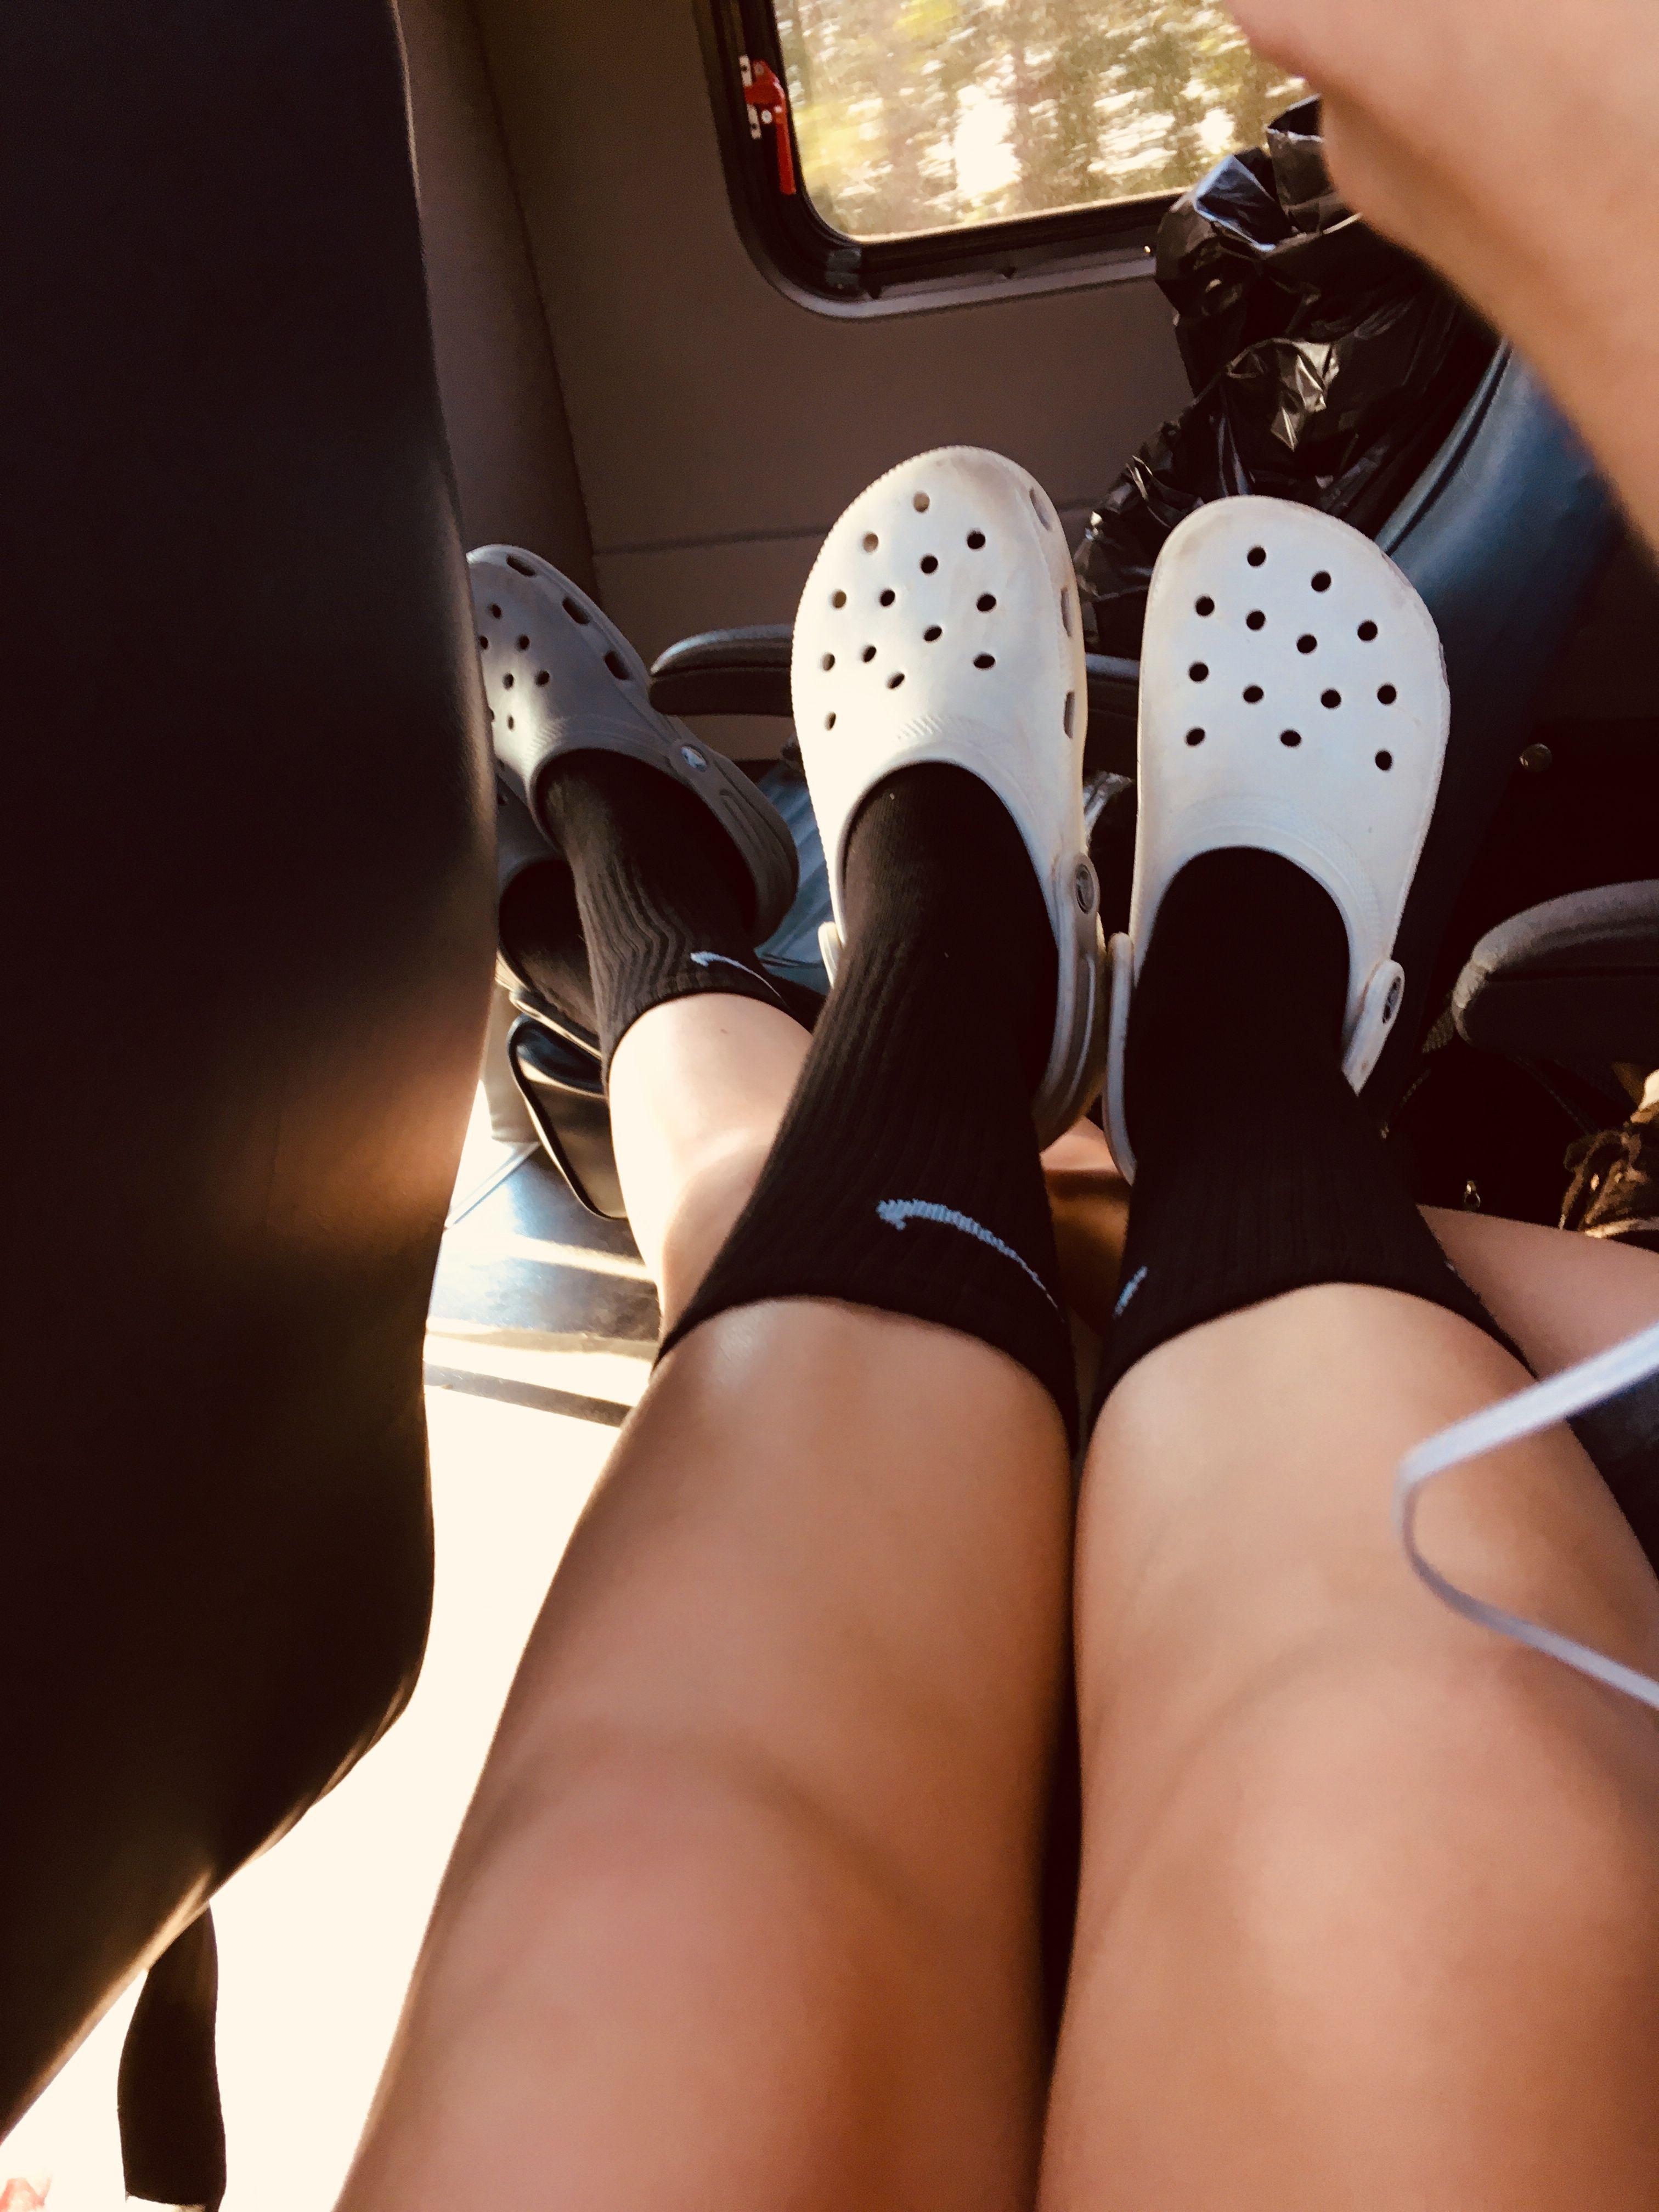 CrocsLife   Nike socks outfit, Nike